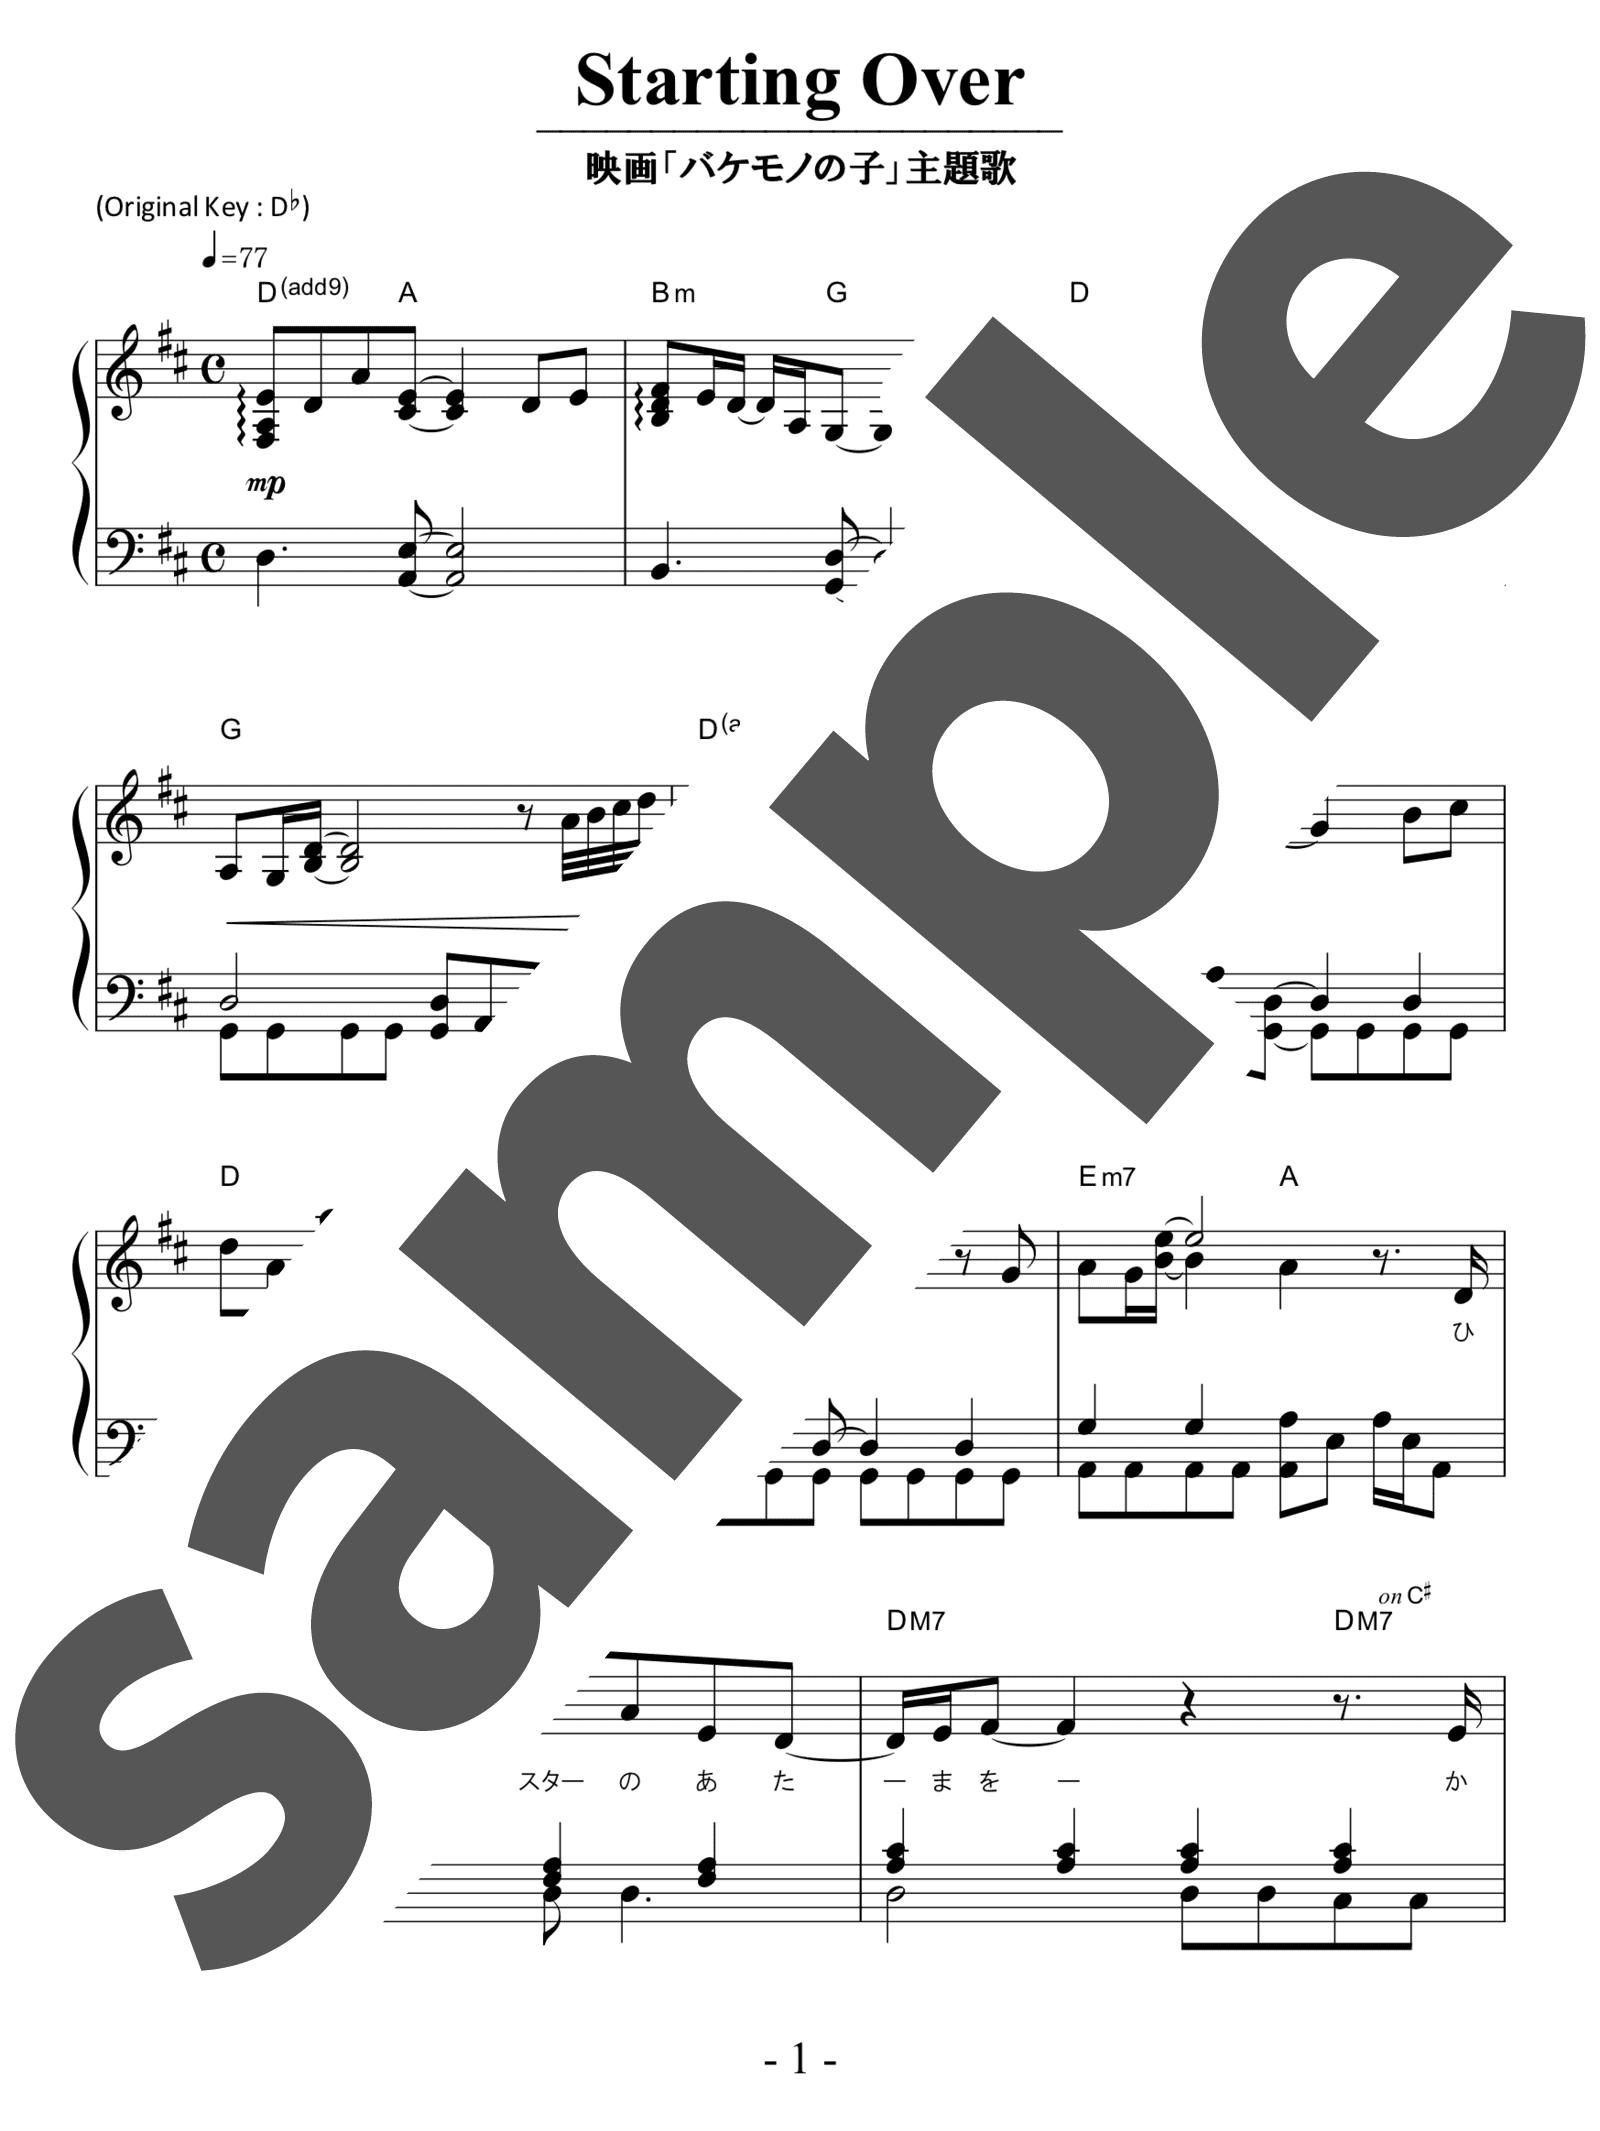 「Starting Over」のサンプル楽譜